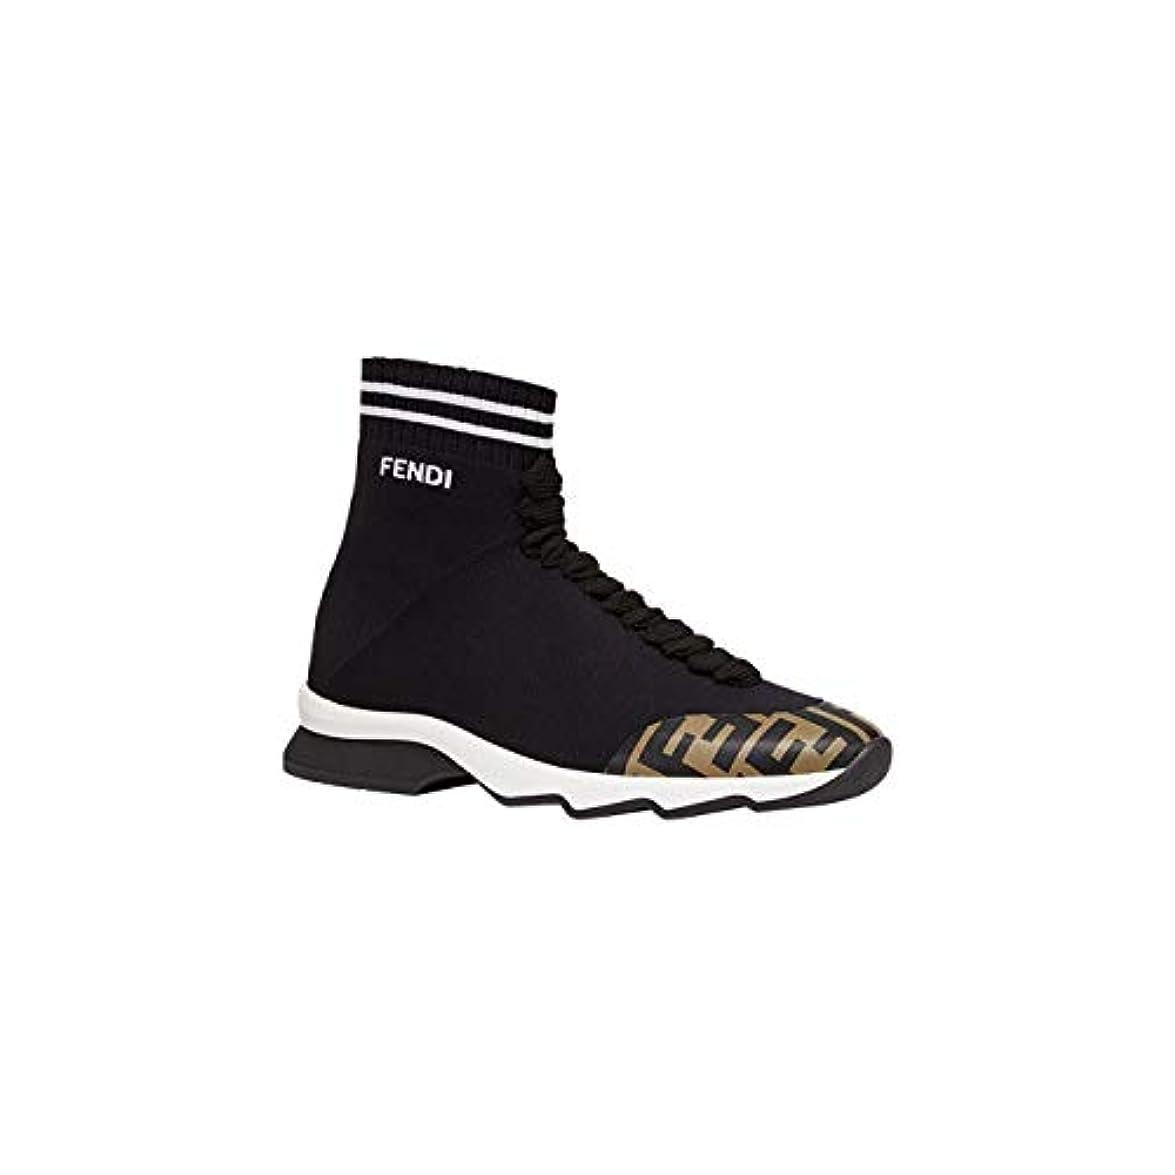 Fendi Hi Top Sneakers Donna 8t6835a622f15ej Poliuretano Nero